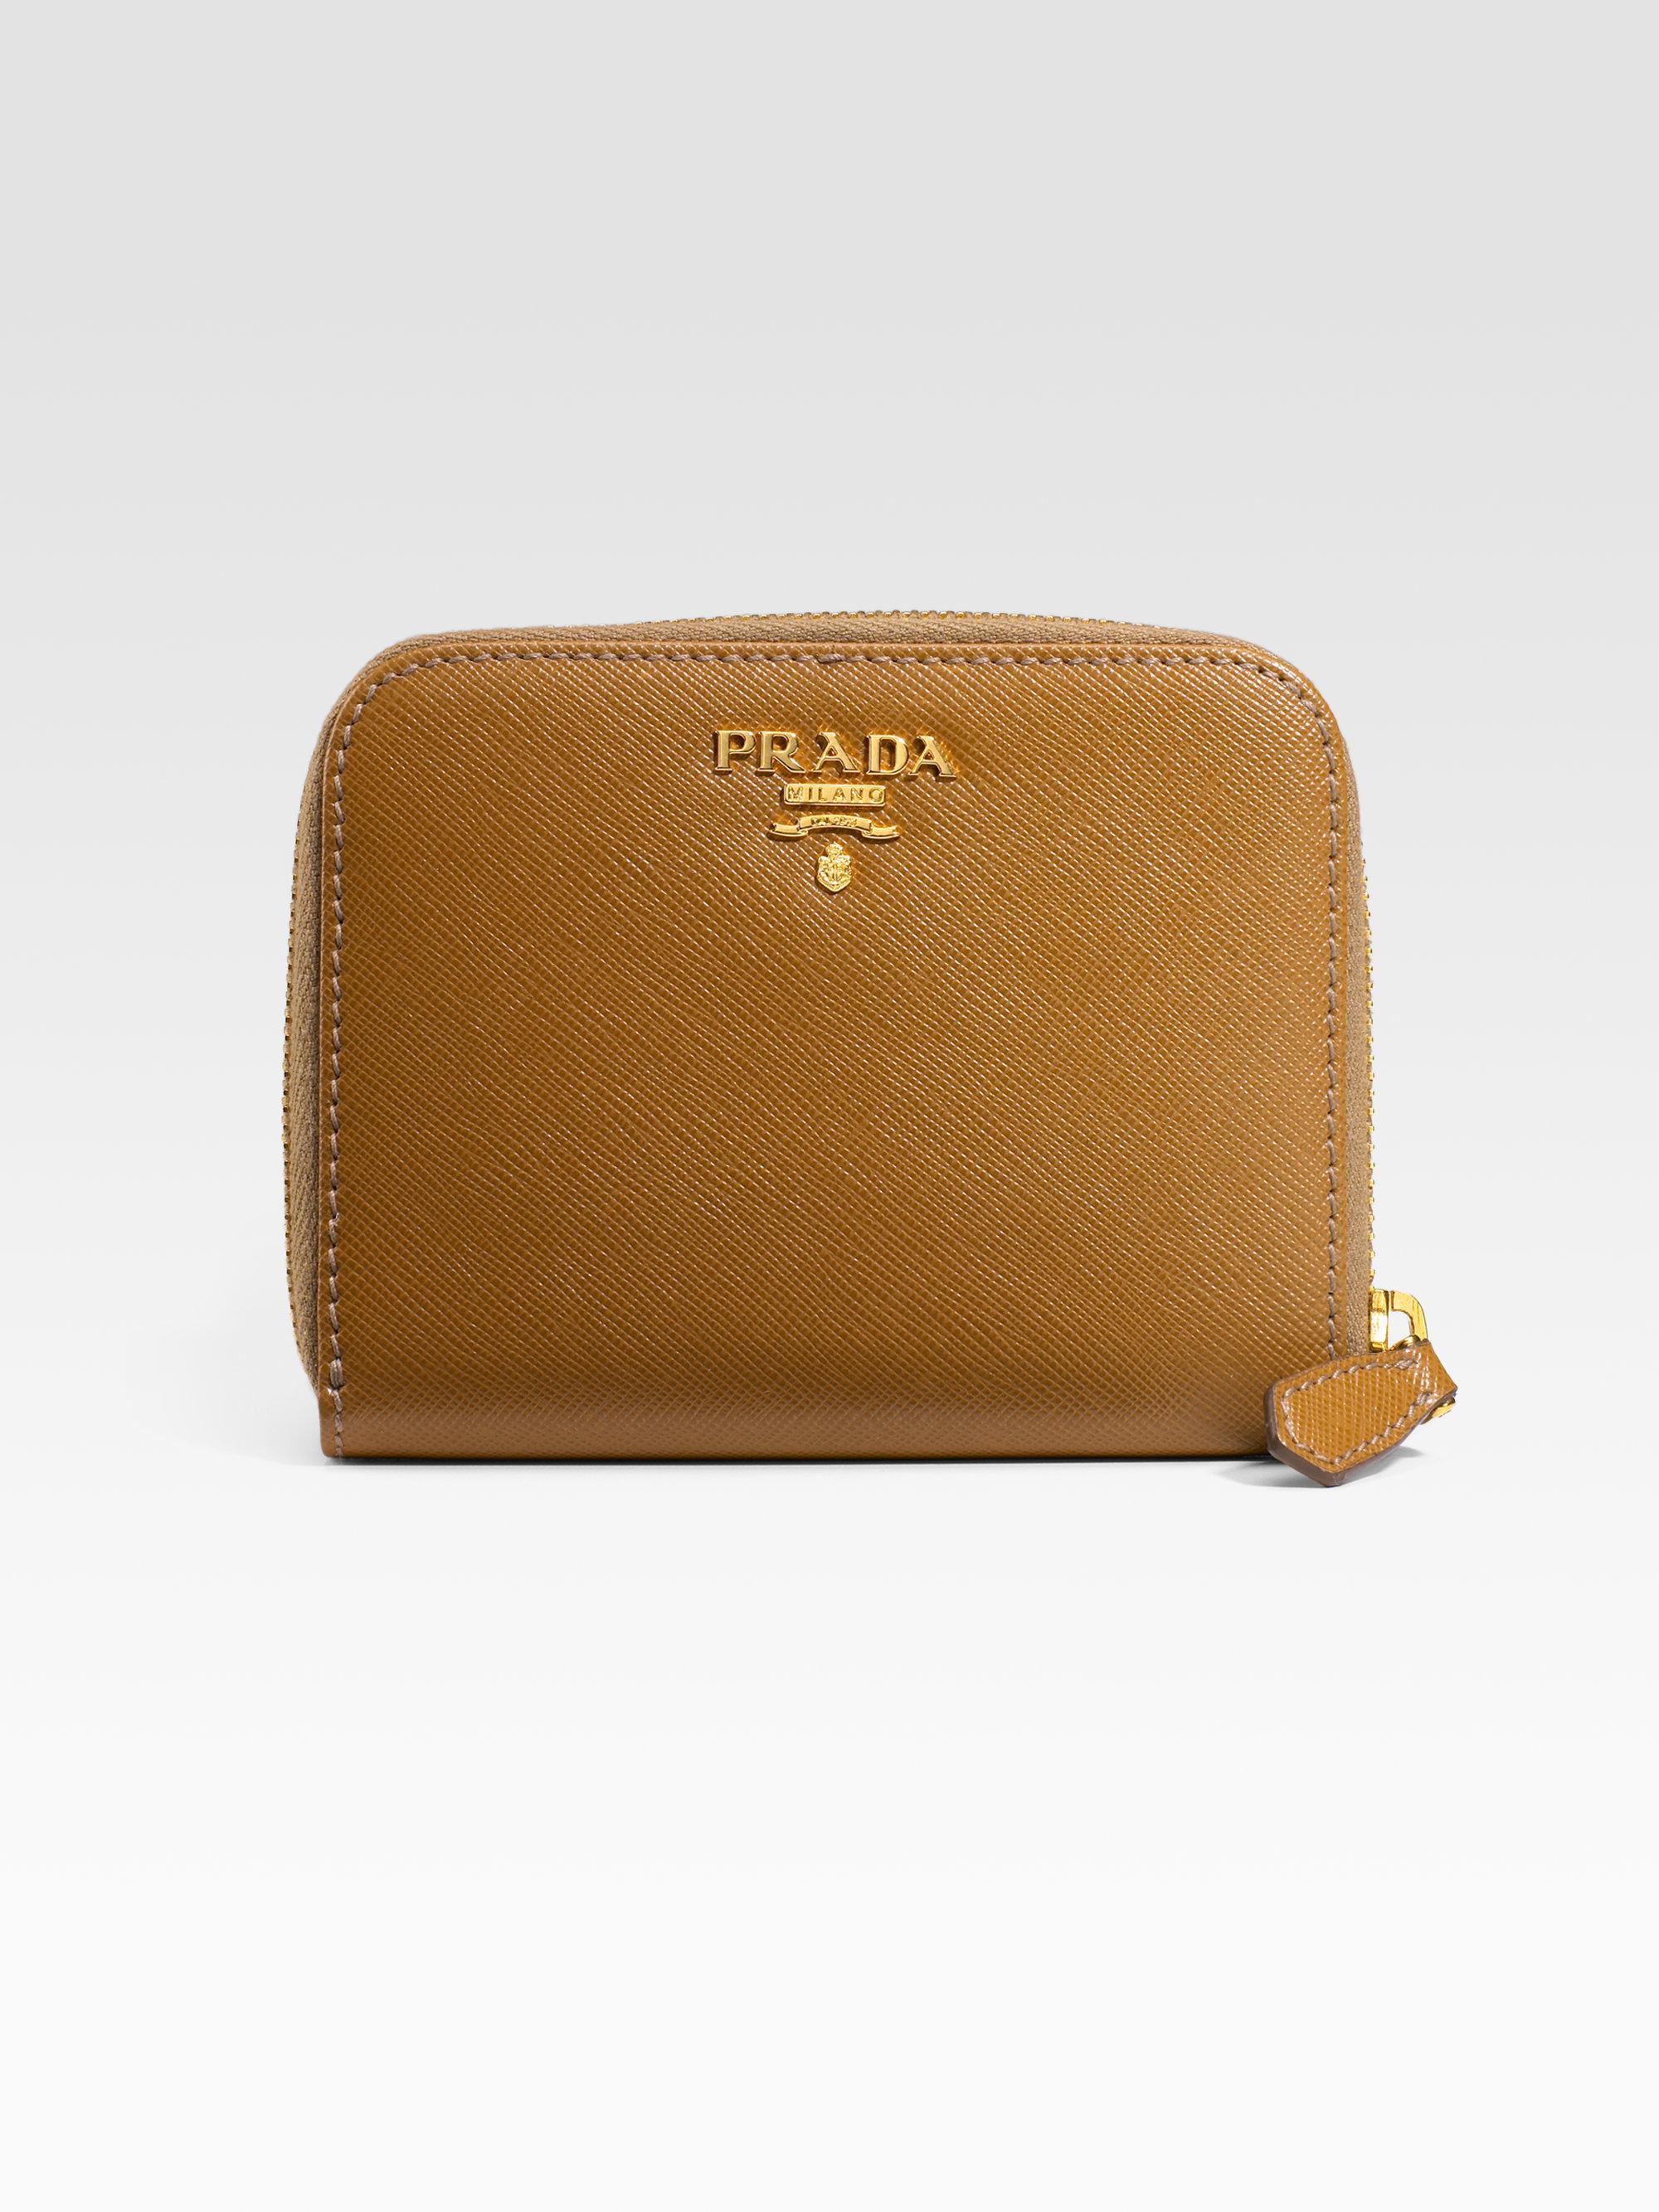 prada vela tote - prada orange leather wallet